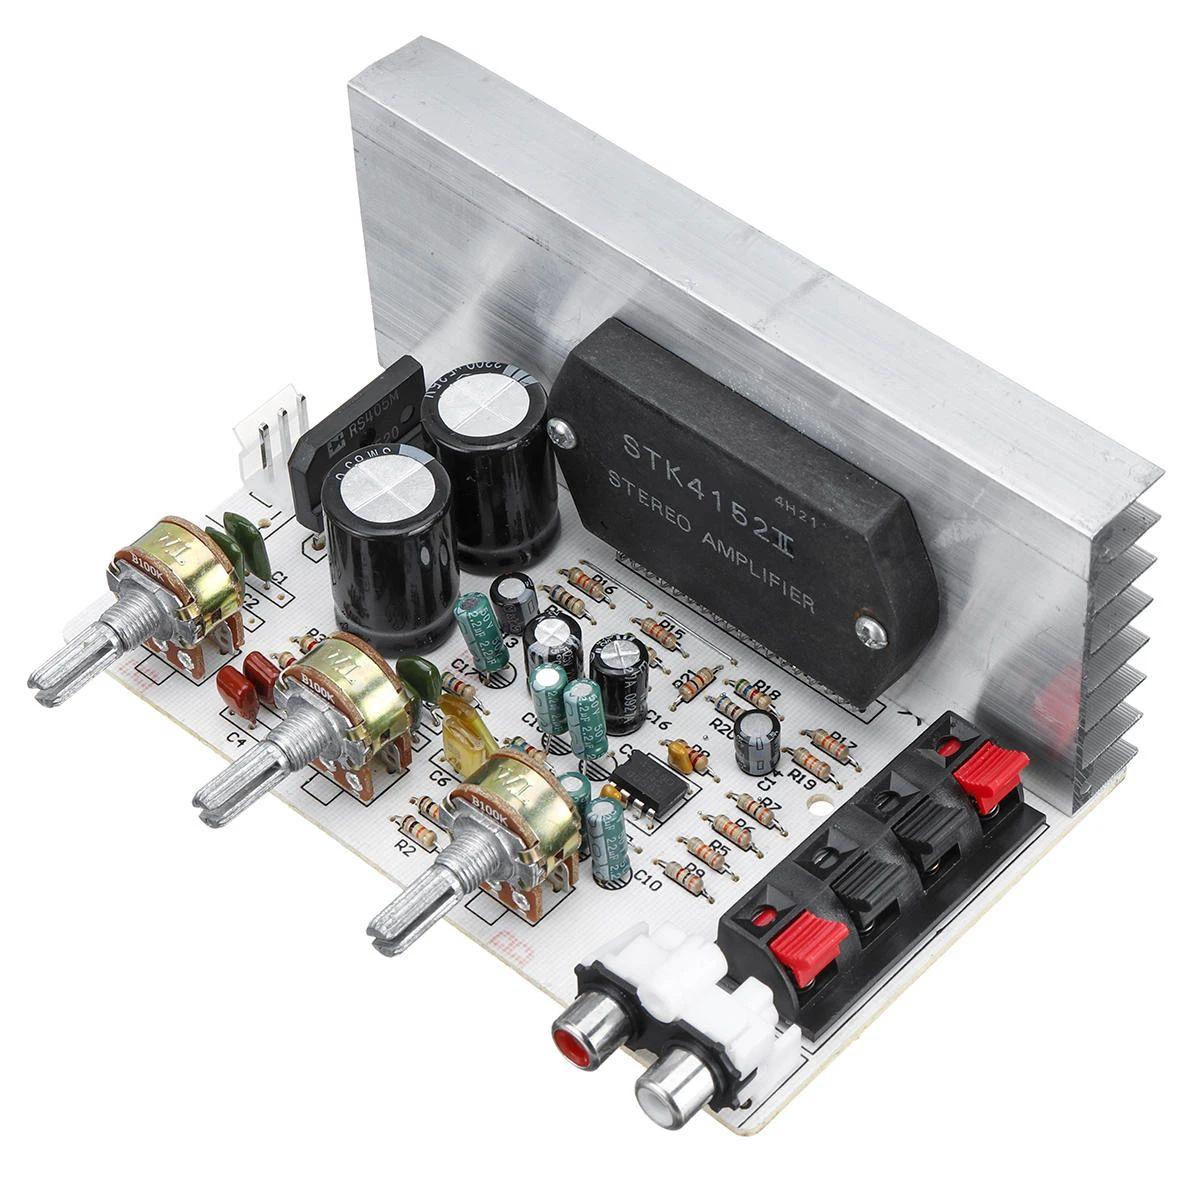 STK4132 50W + 50W DX-0408 2.0 Canal STK Película gruesa Serie Amplificador placa 10HZ-20KHZ